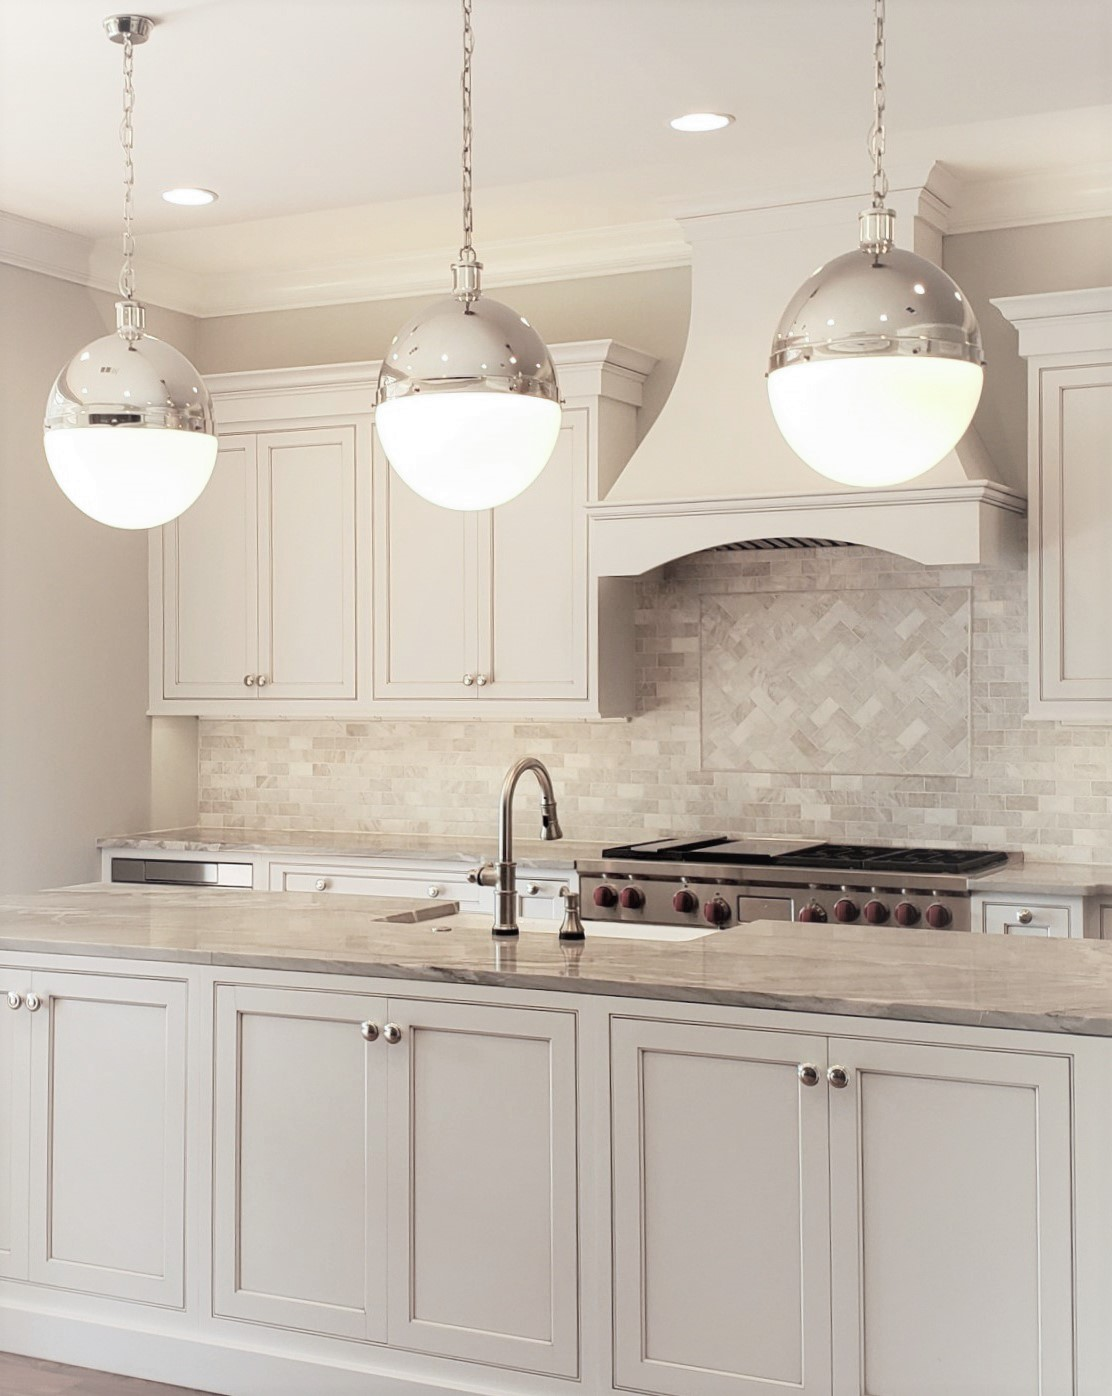 LUXE Homes Pro 035 kitchen.jpg